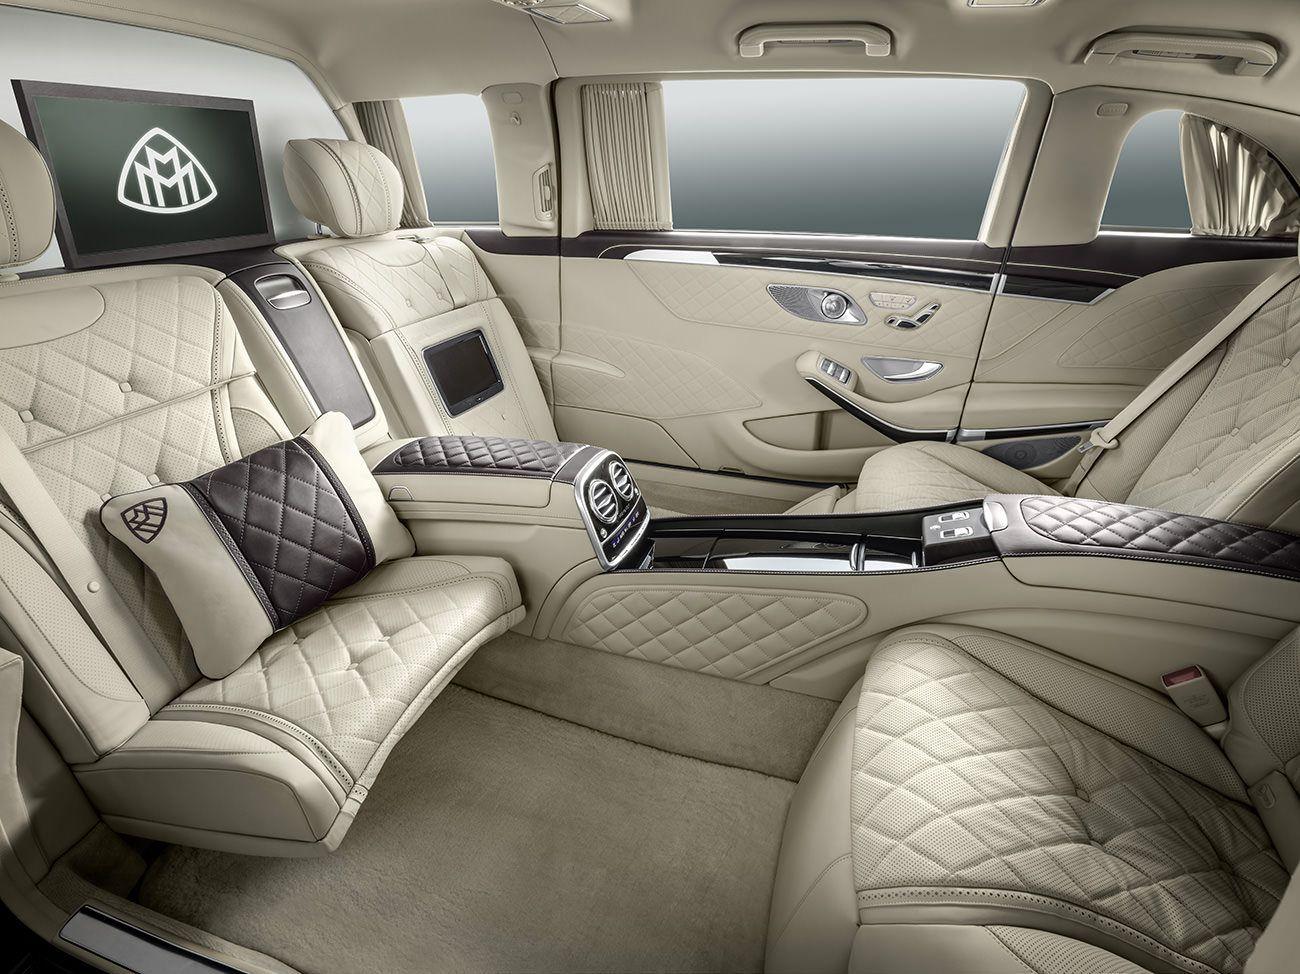 maybach mercedes benz s class limousine interior | traumautos